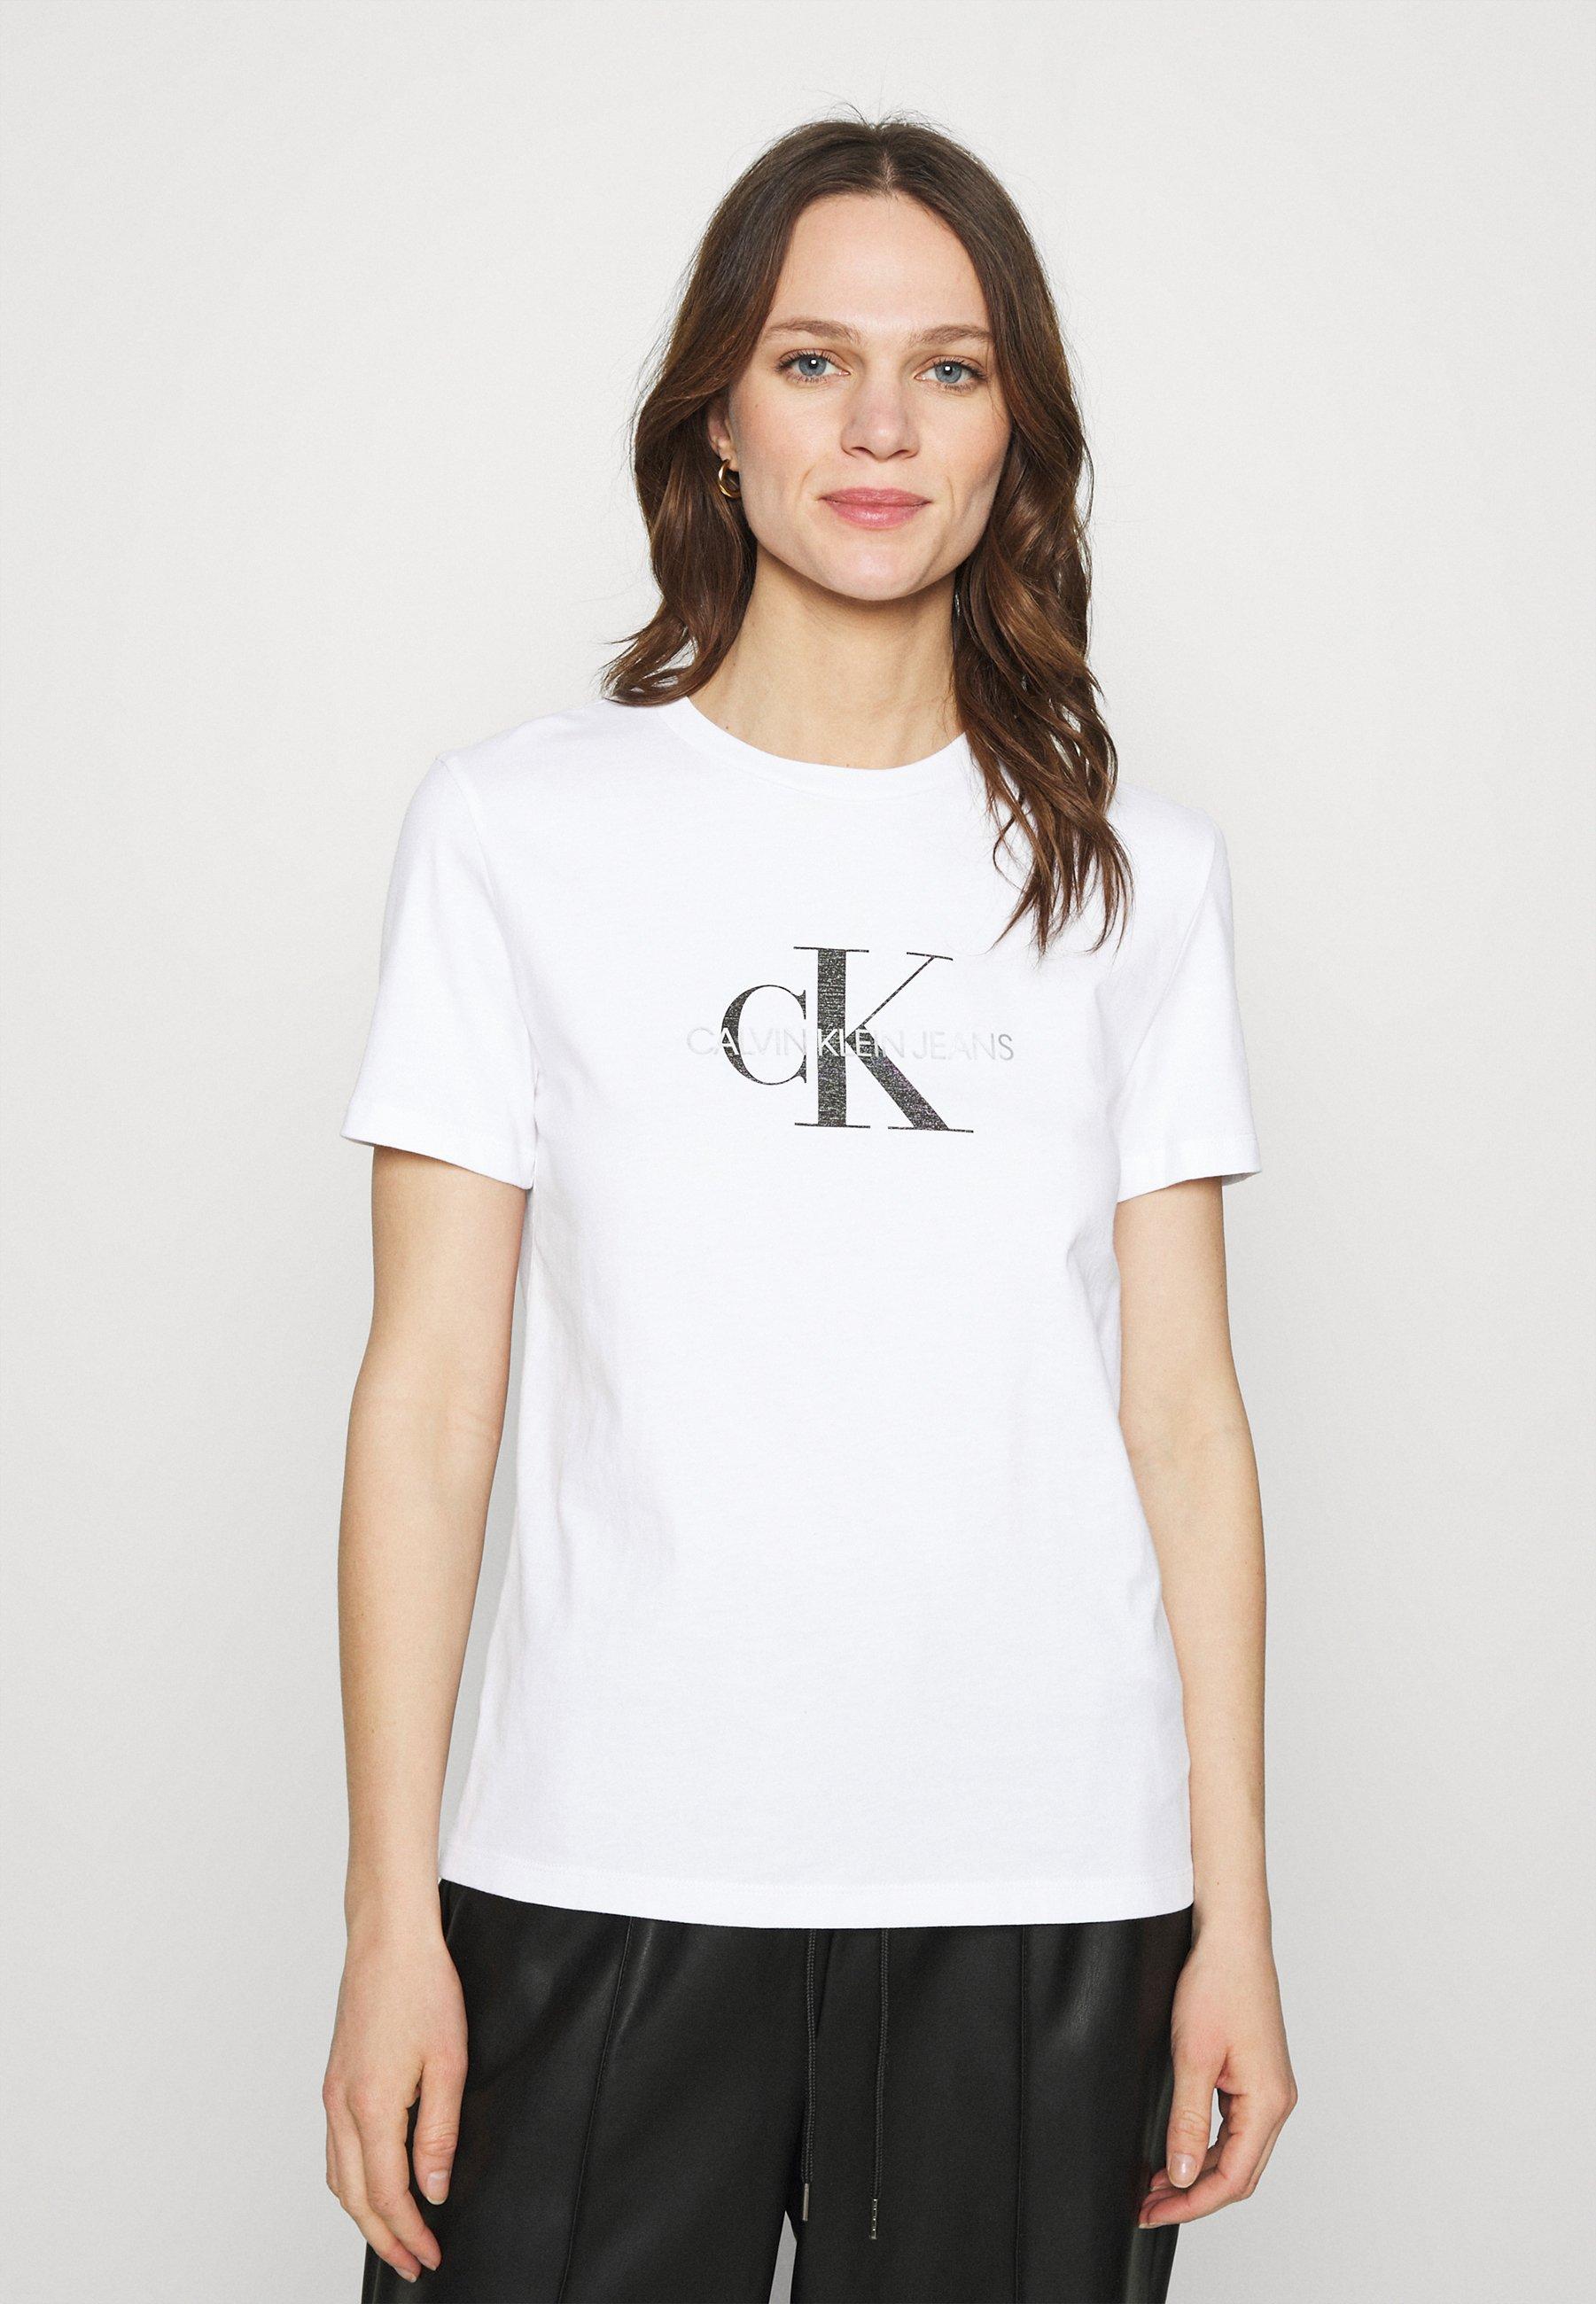 Donna REFLECTIVE MONOGRAM TEE - T-shirt con stampa